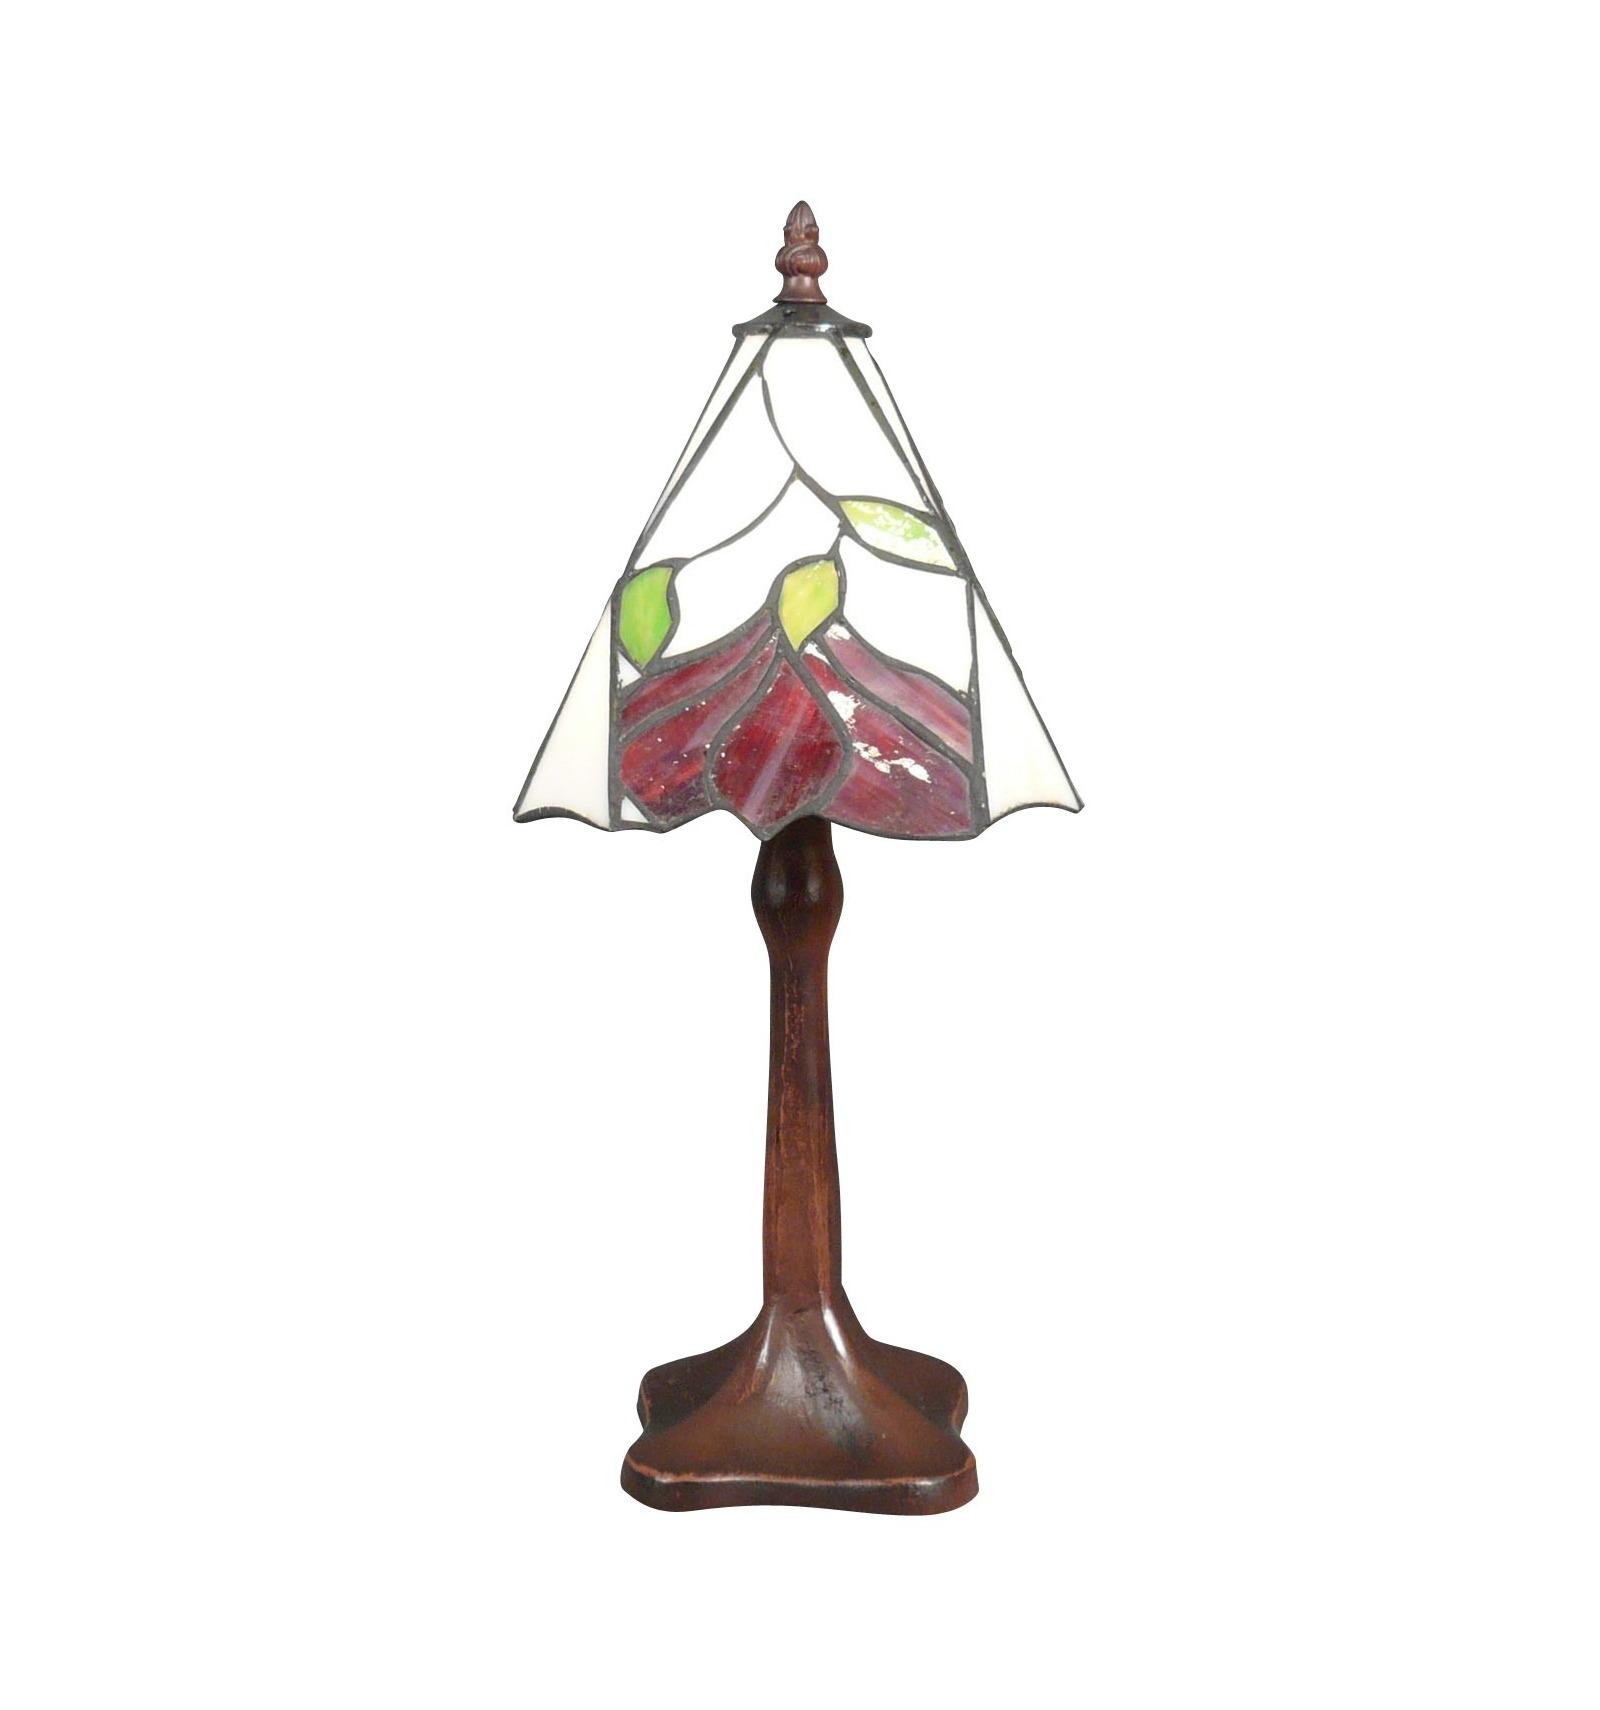 tiffany lamp with floral decoration light. Black Bedroom Furniture Sets. Home Design Ideas